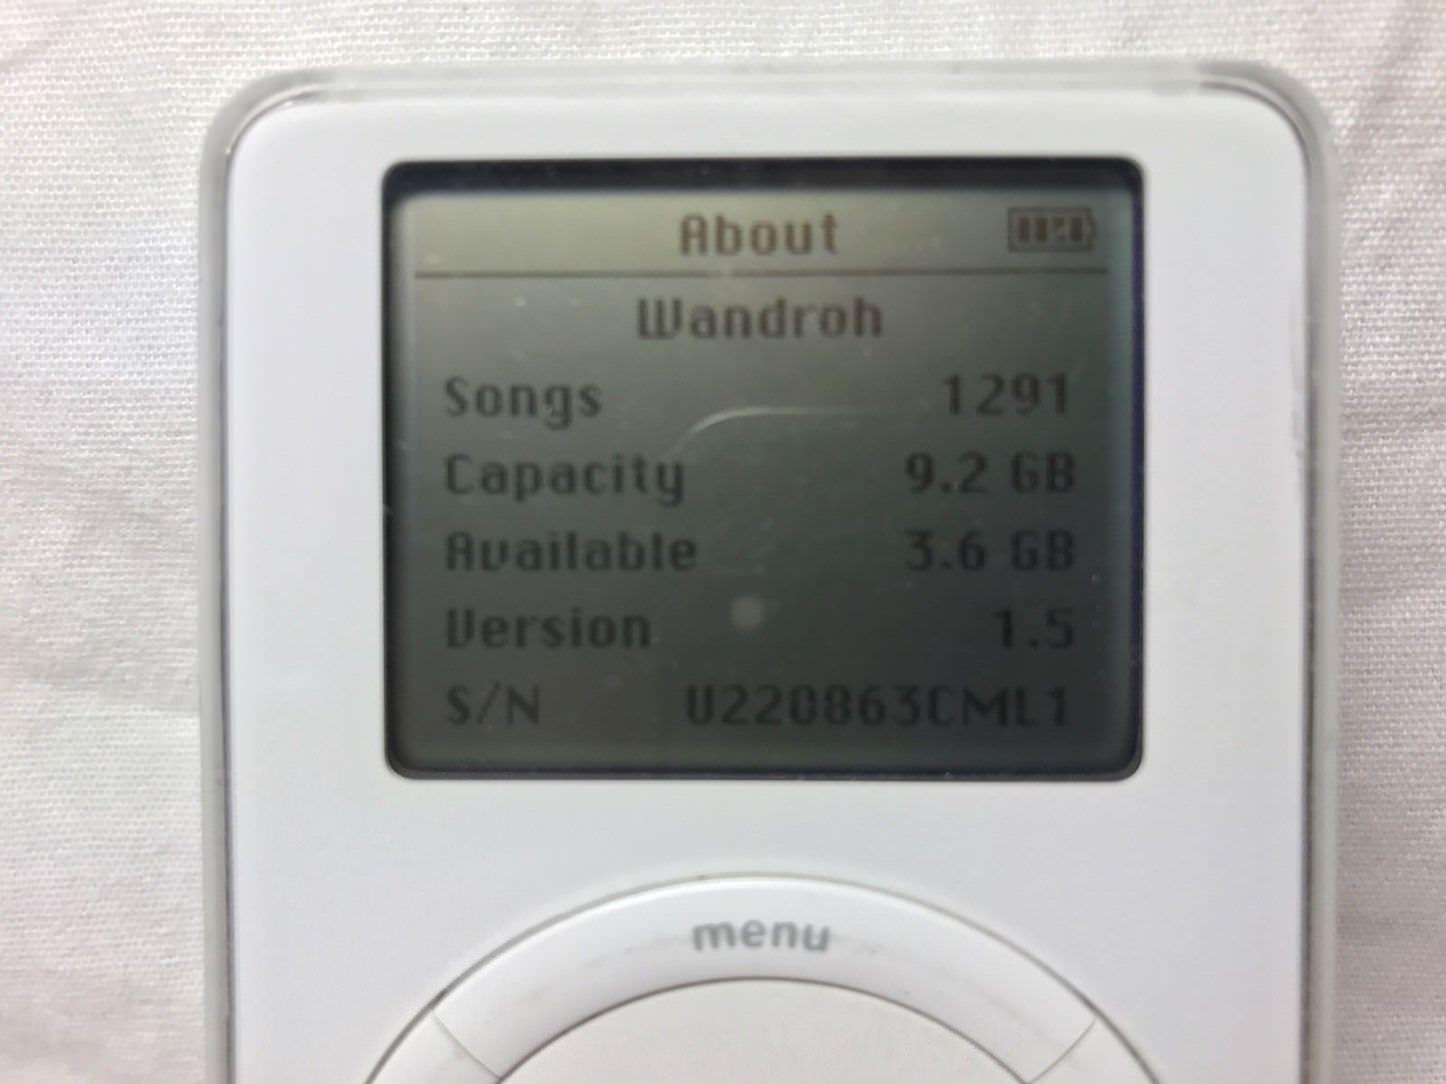 Apple-iPod-Classic-P95-DVT-1stGen-2.jpg